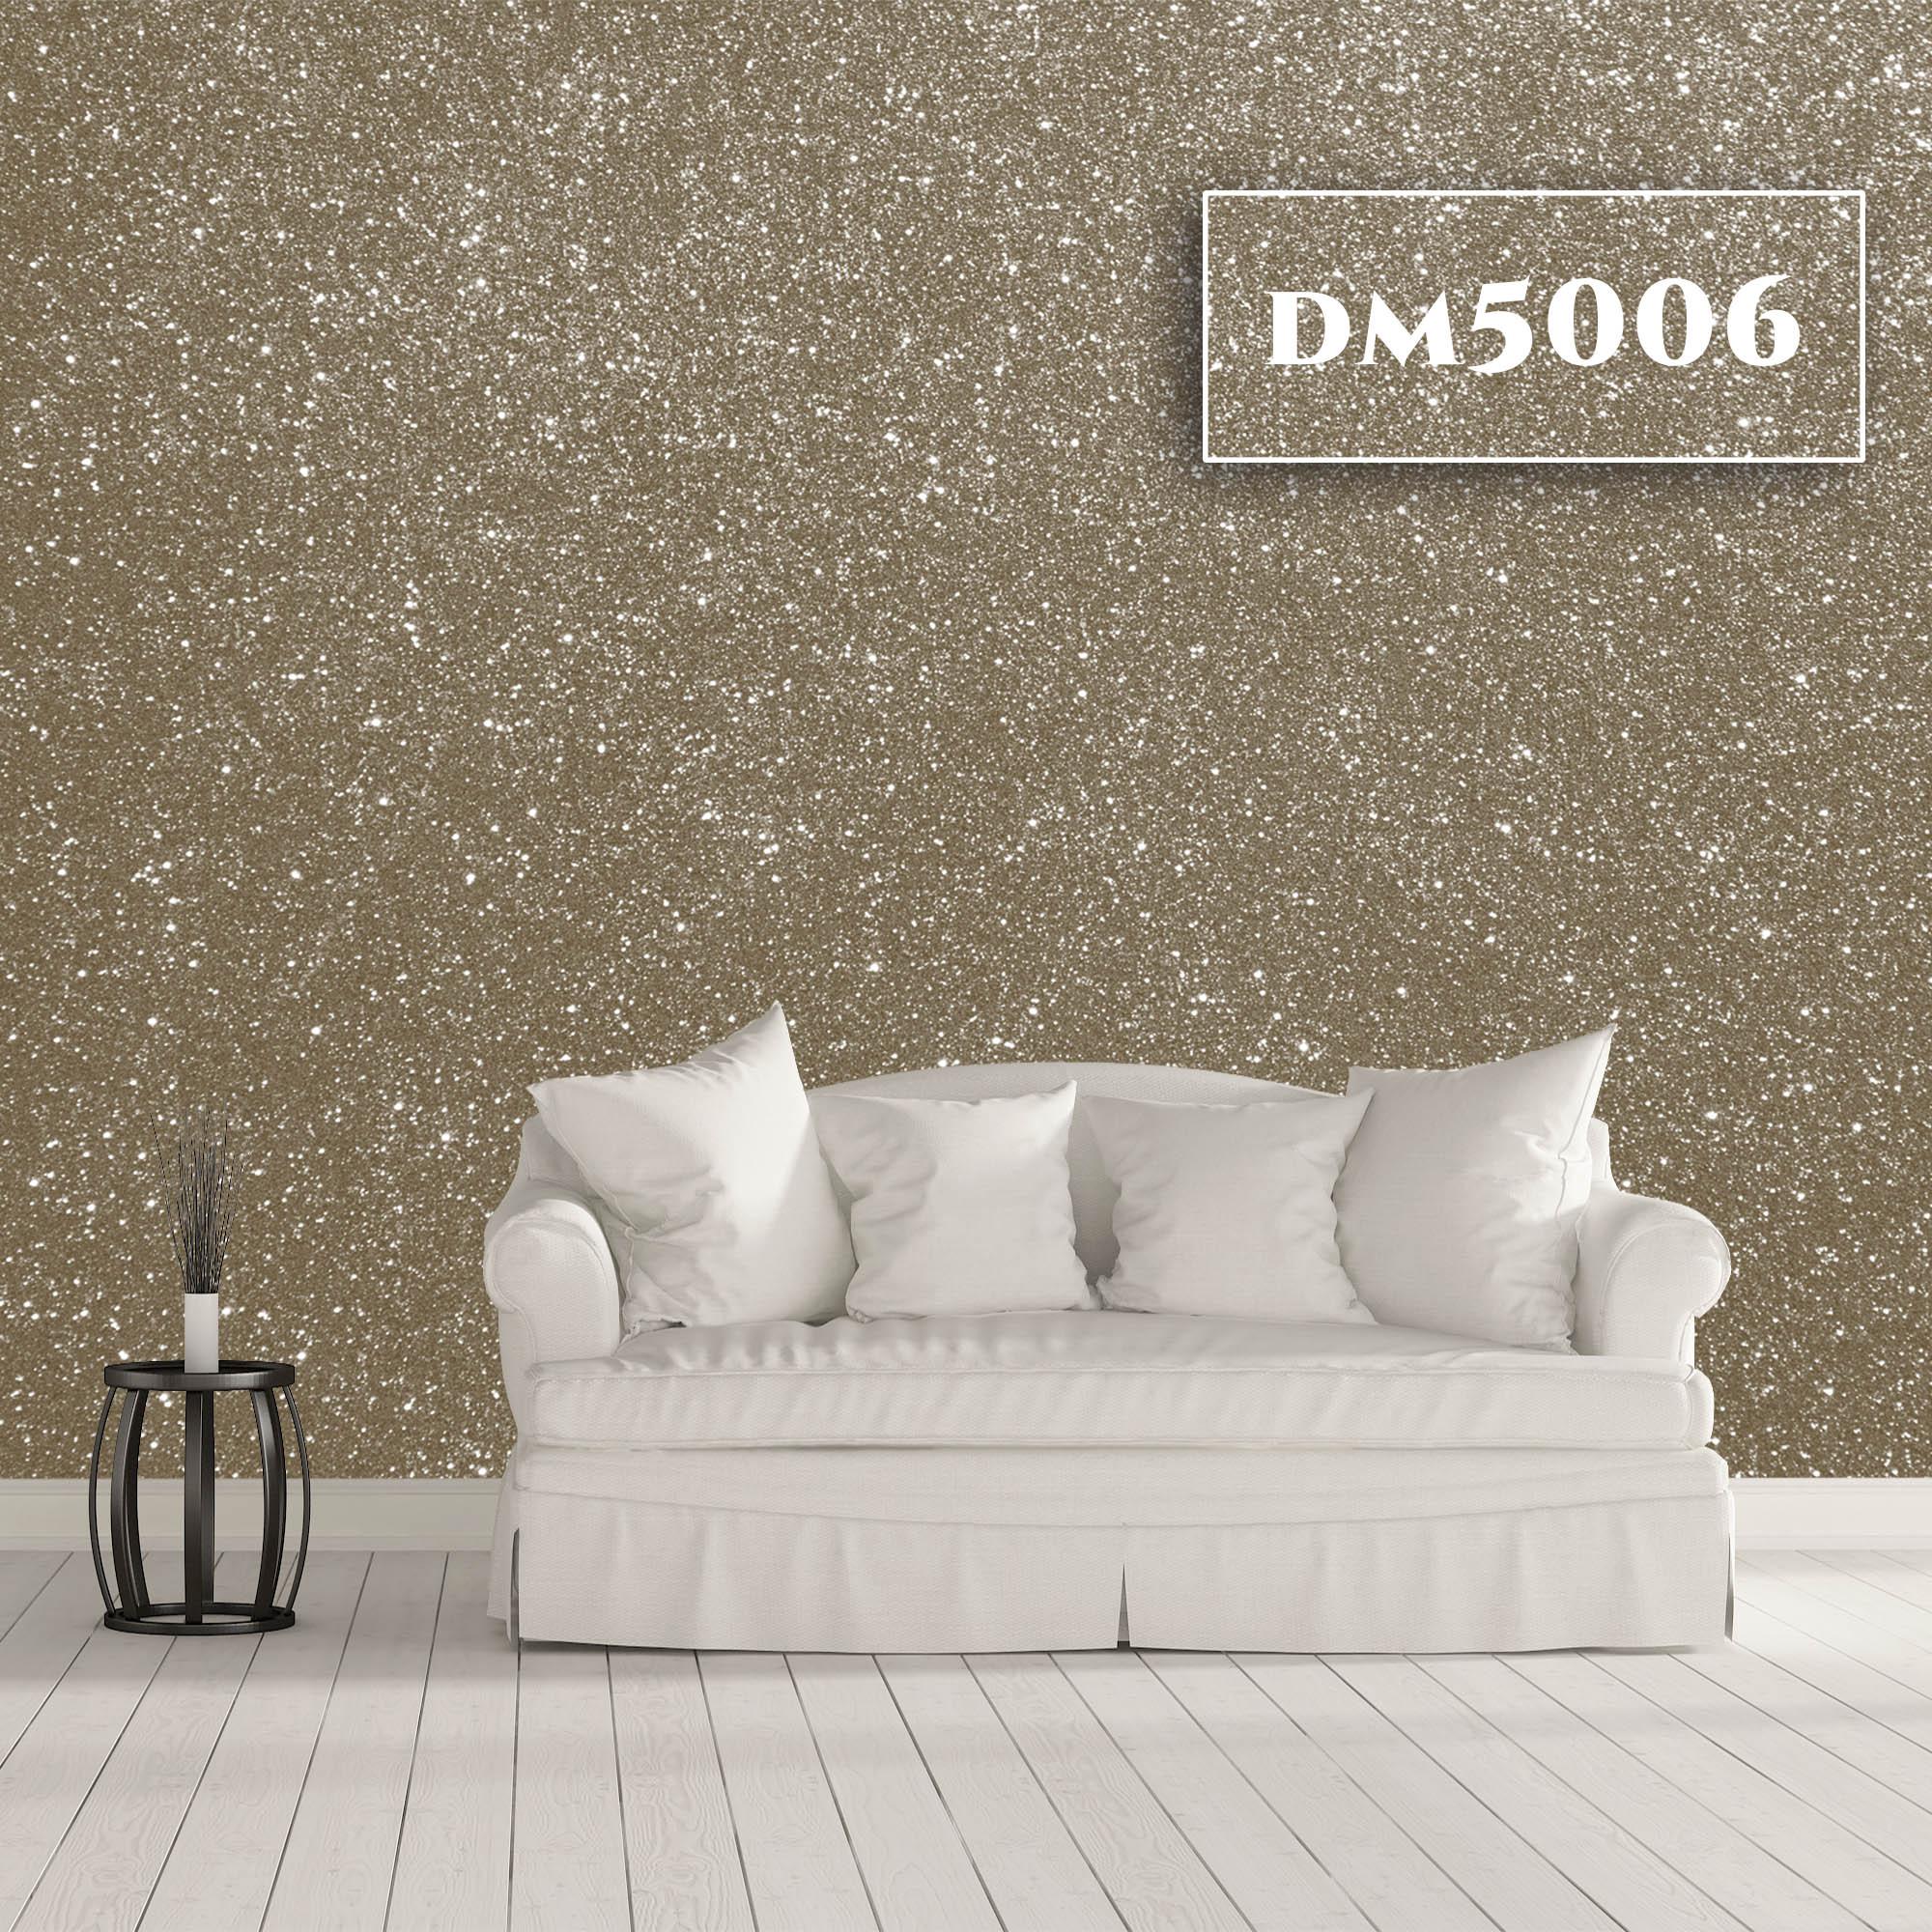 DM5006